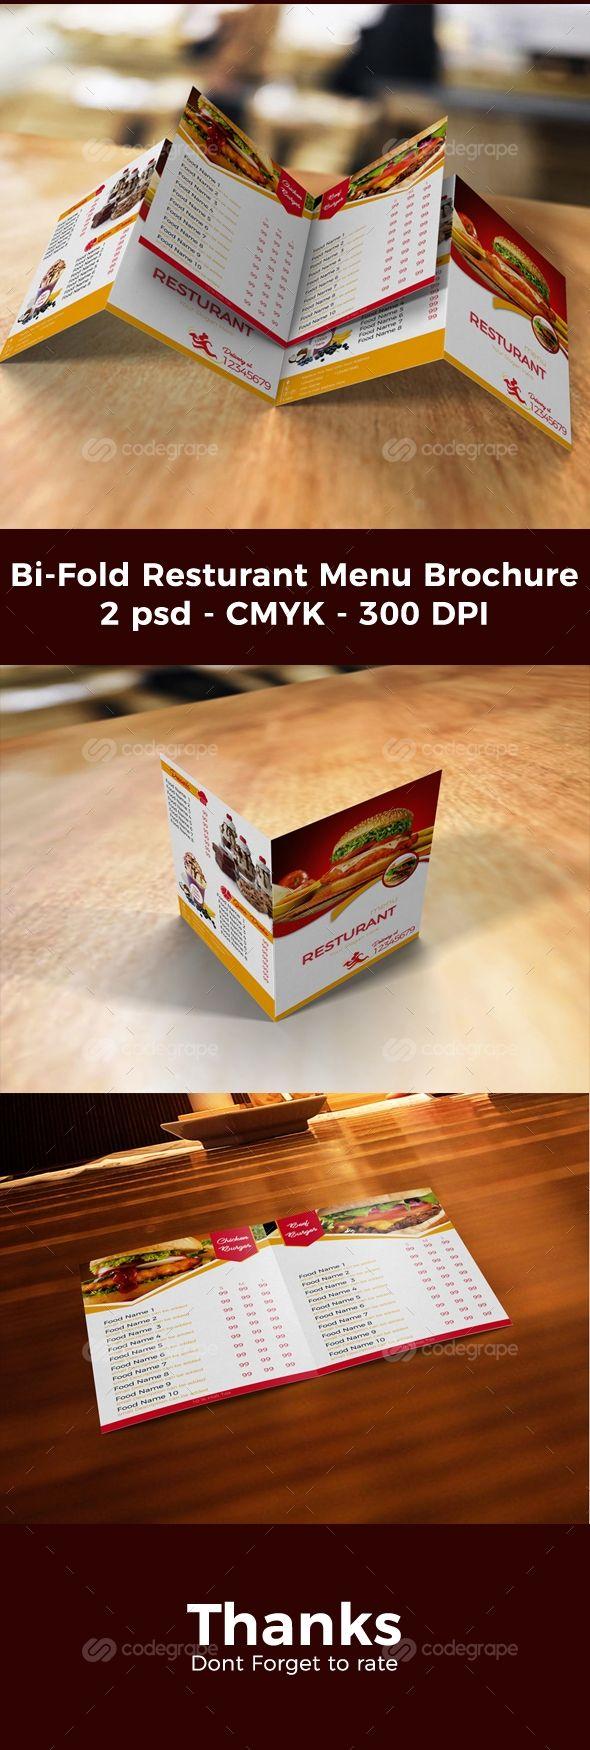 Bi-Fold Resturant Menu Brochure on @codegrape. More Info: https://www.codegrape.com/item/bi-fold-resturant-menu-brochure/11875